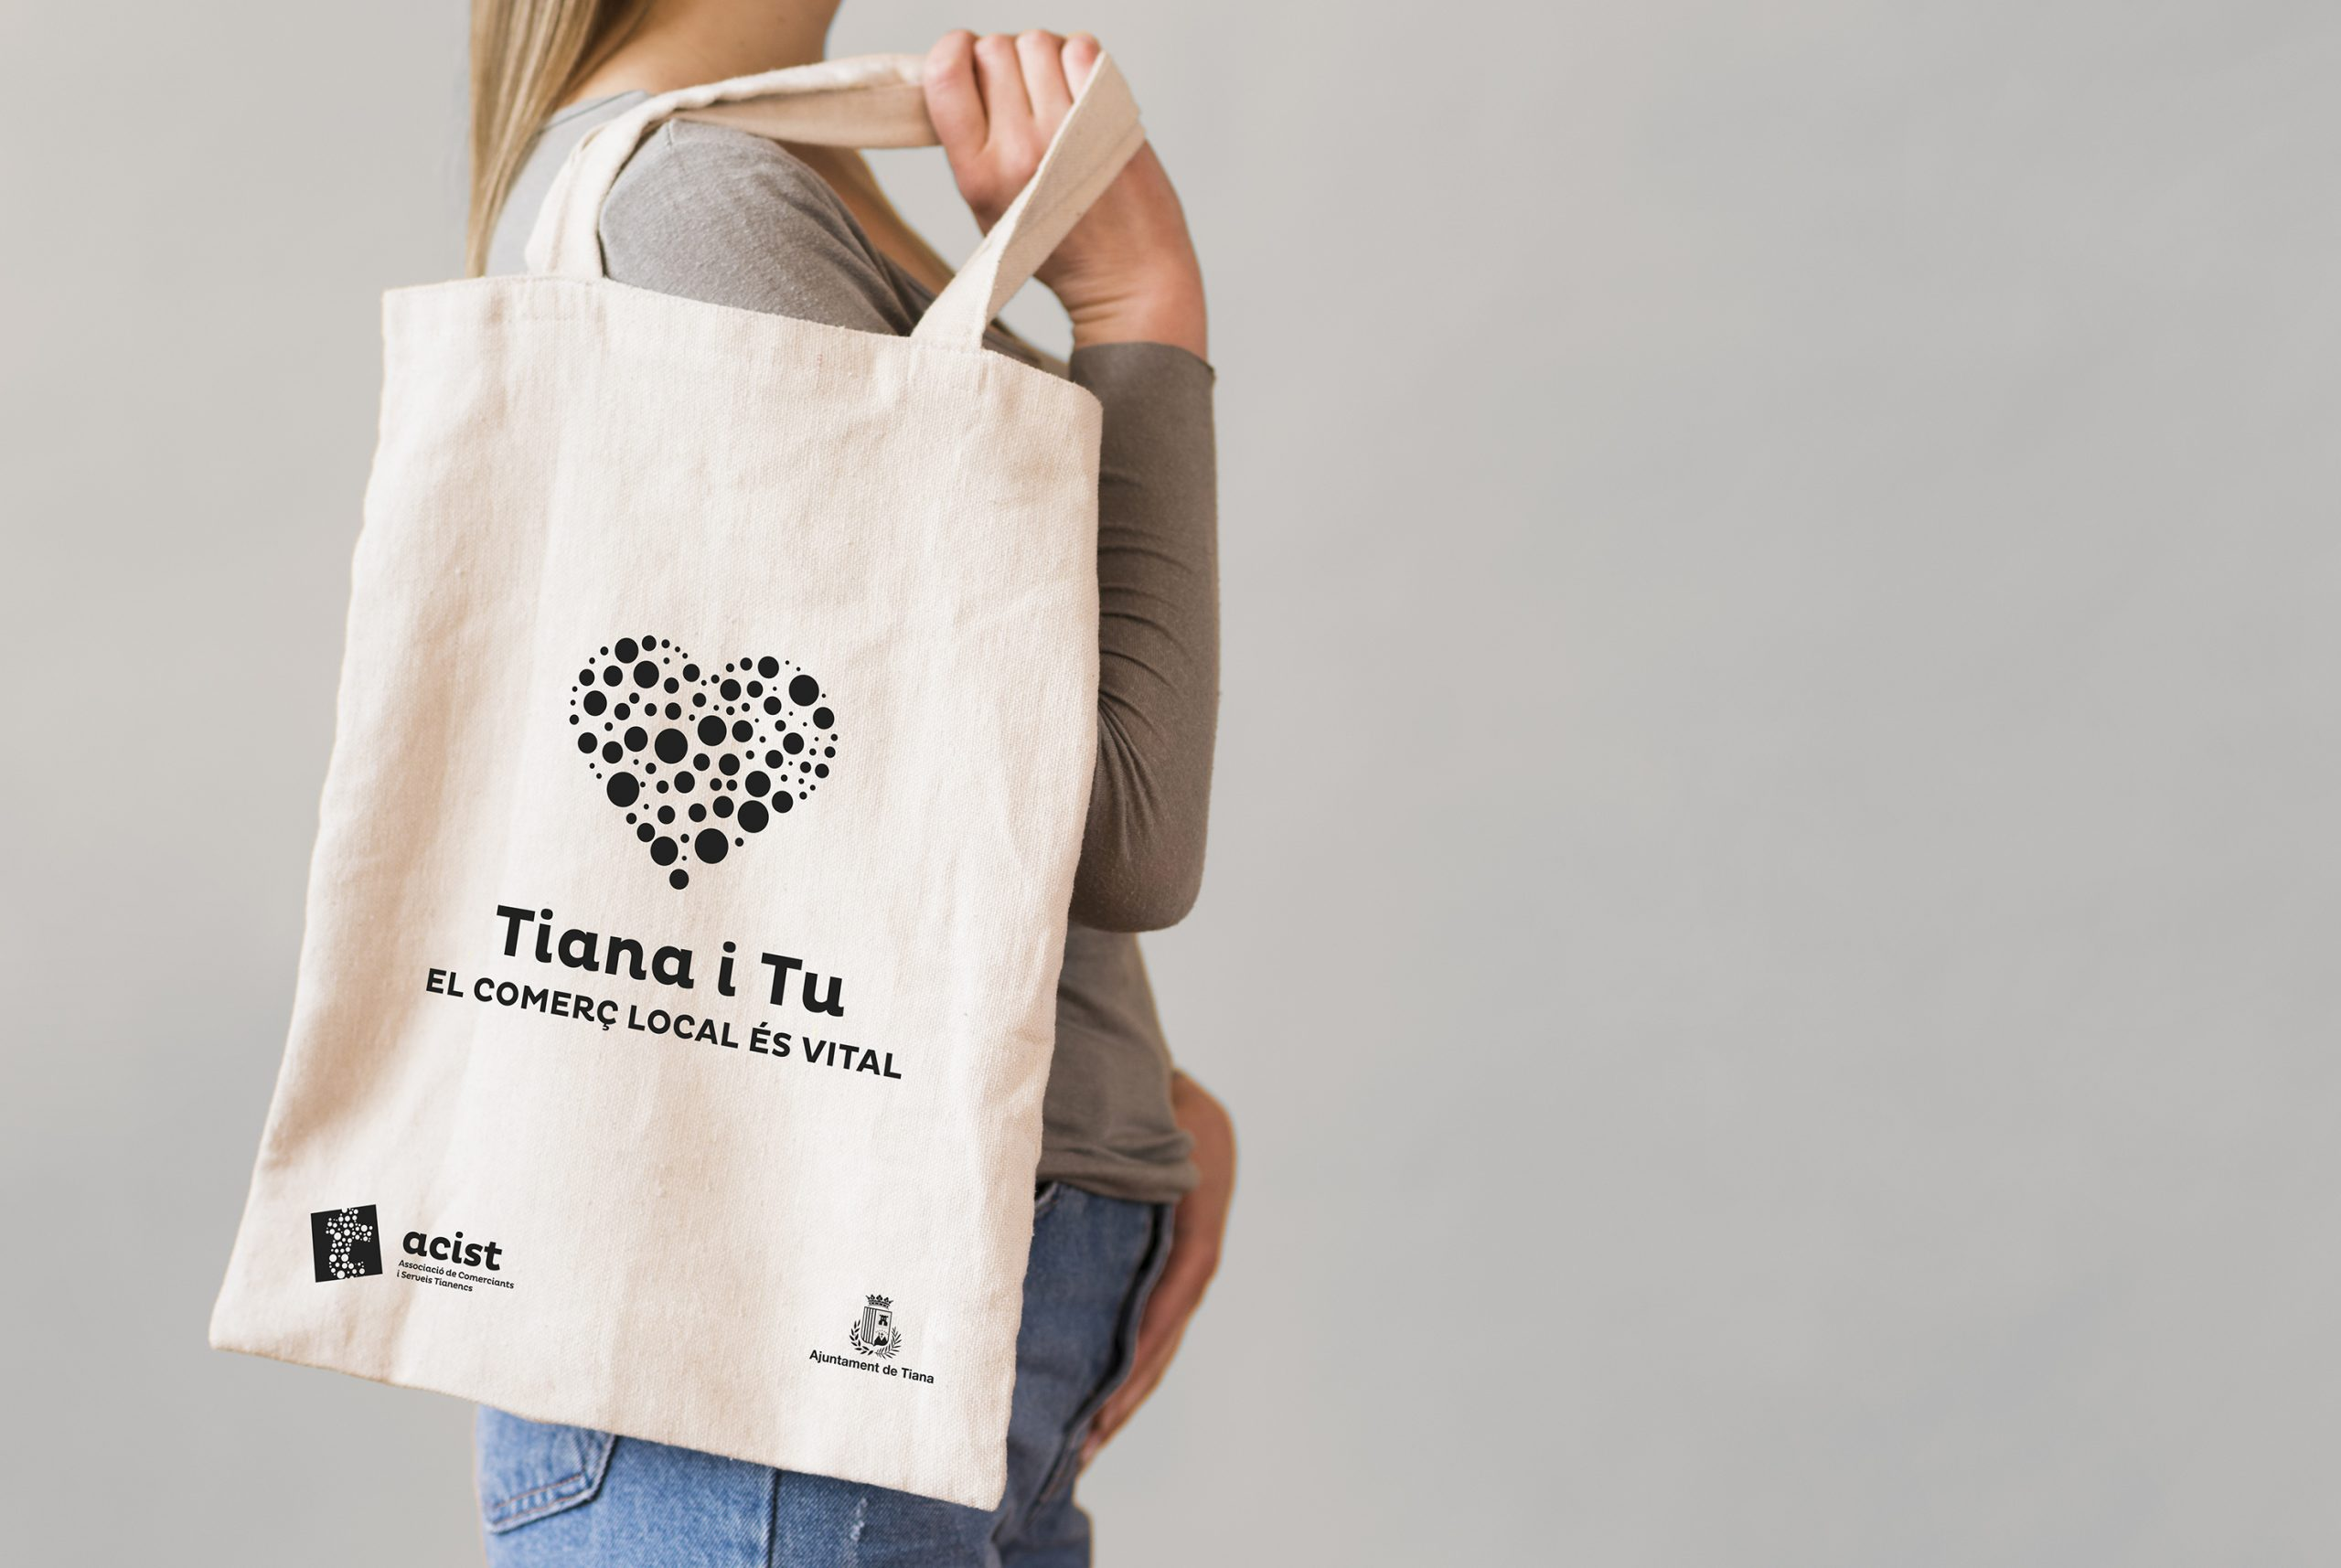 Campanya ACIST - Tiana i tu totebag